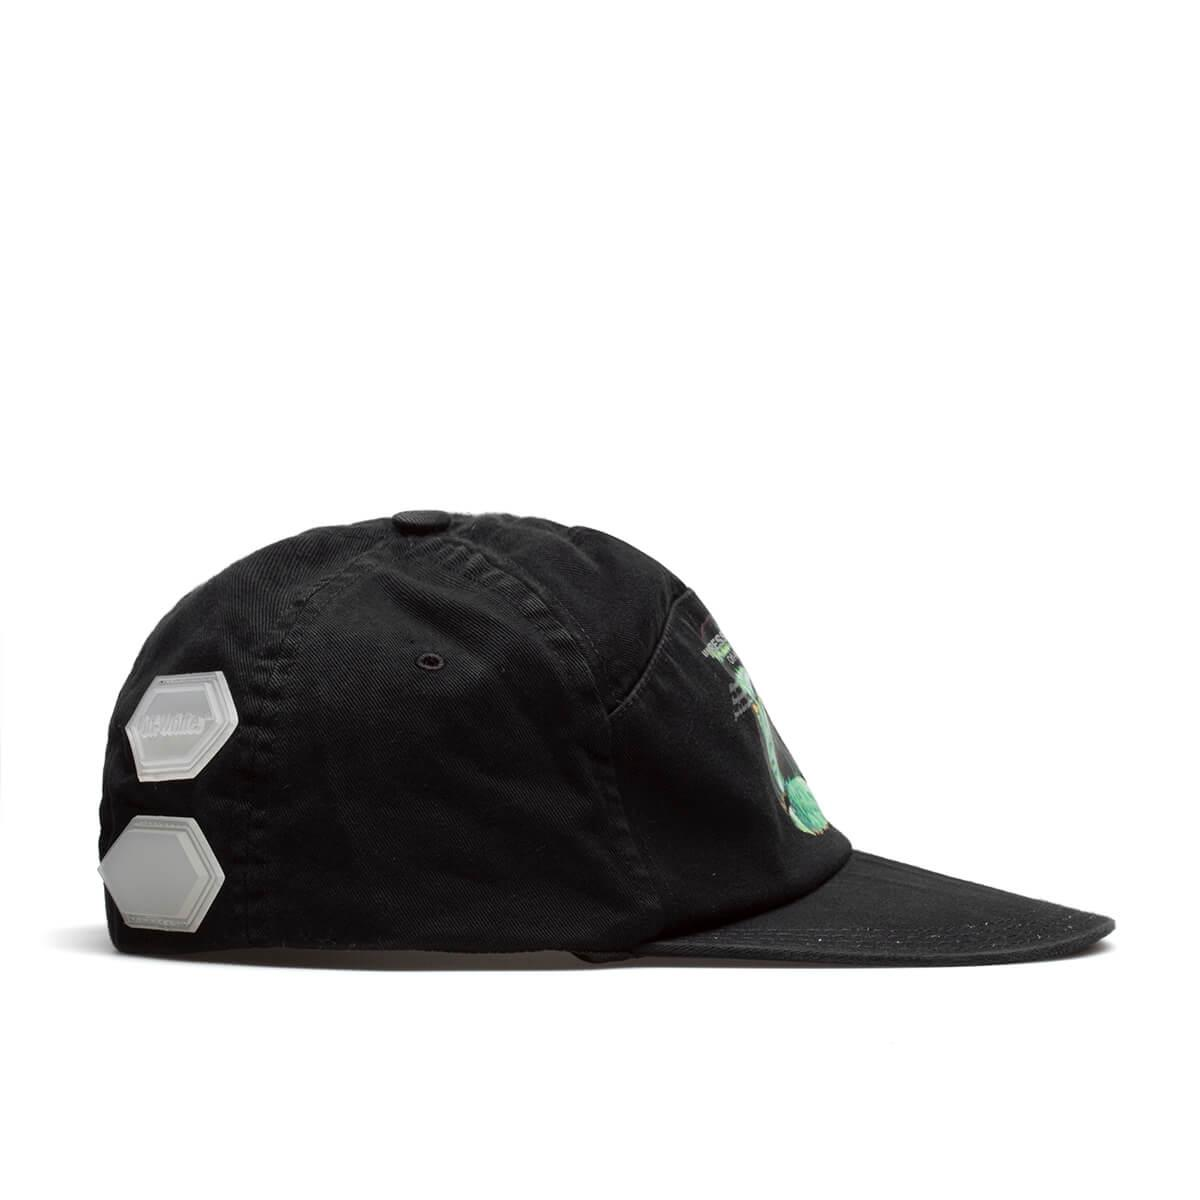 abf7a0b74ce5e Lyst - Off-White c o Virgil Abloh Green Man Cap in Black for Men